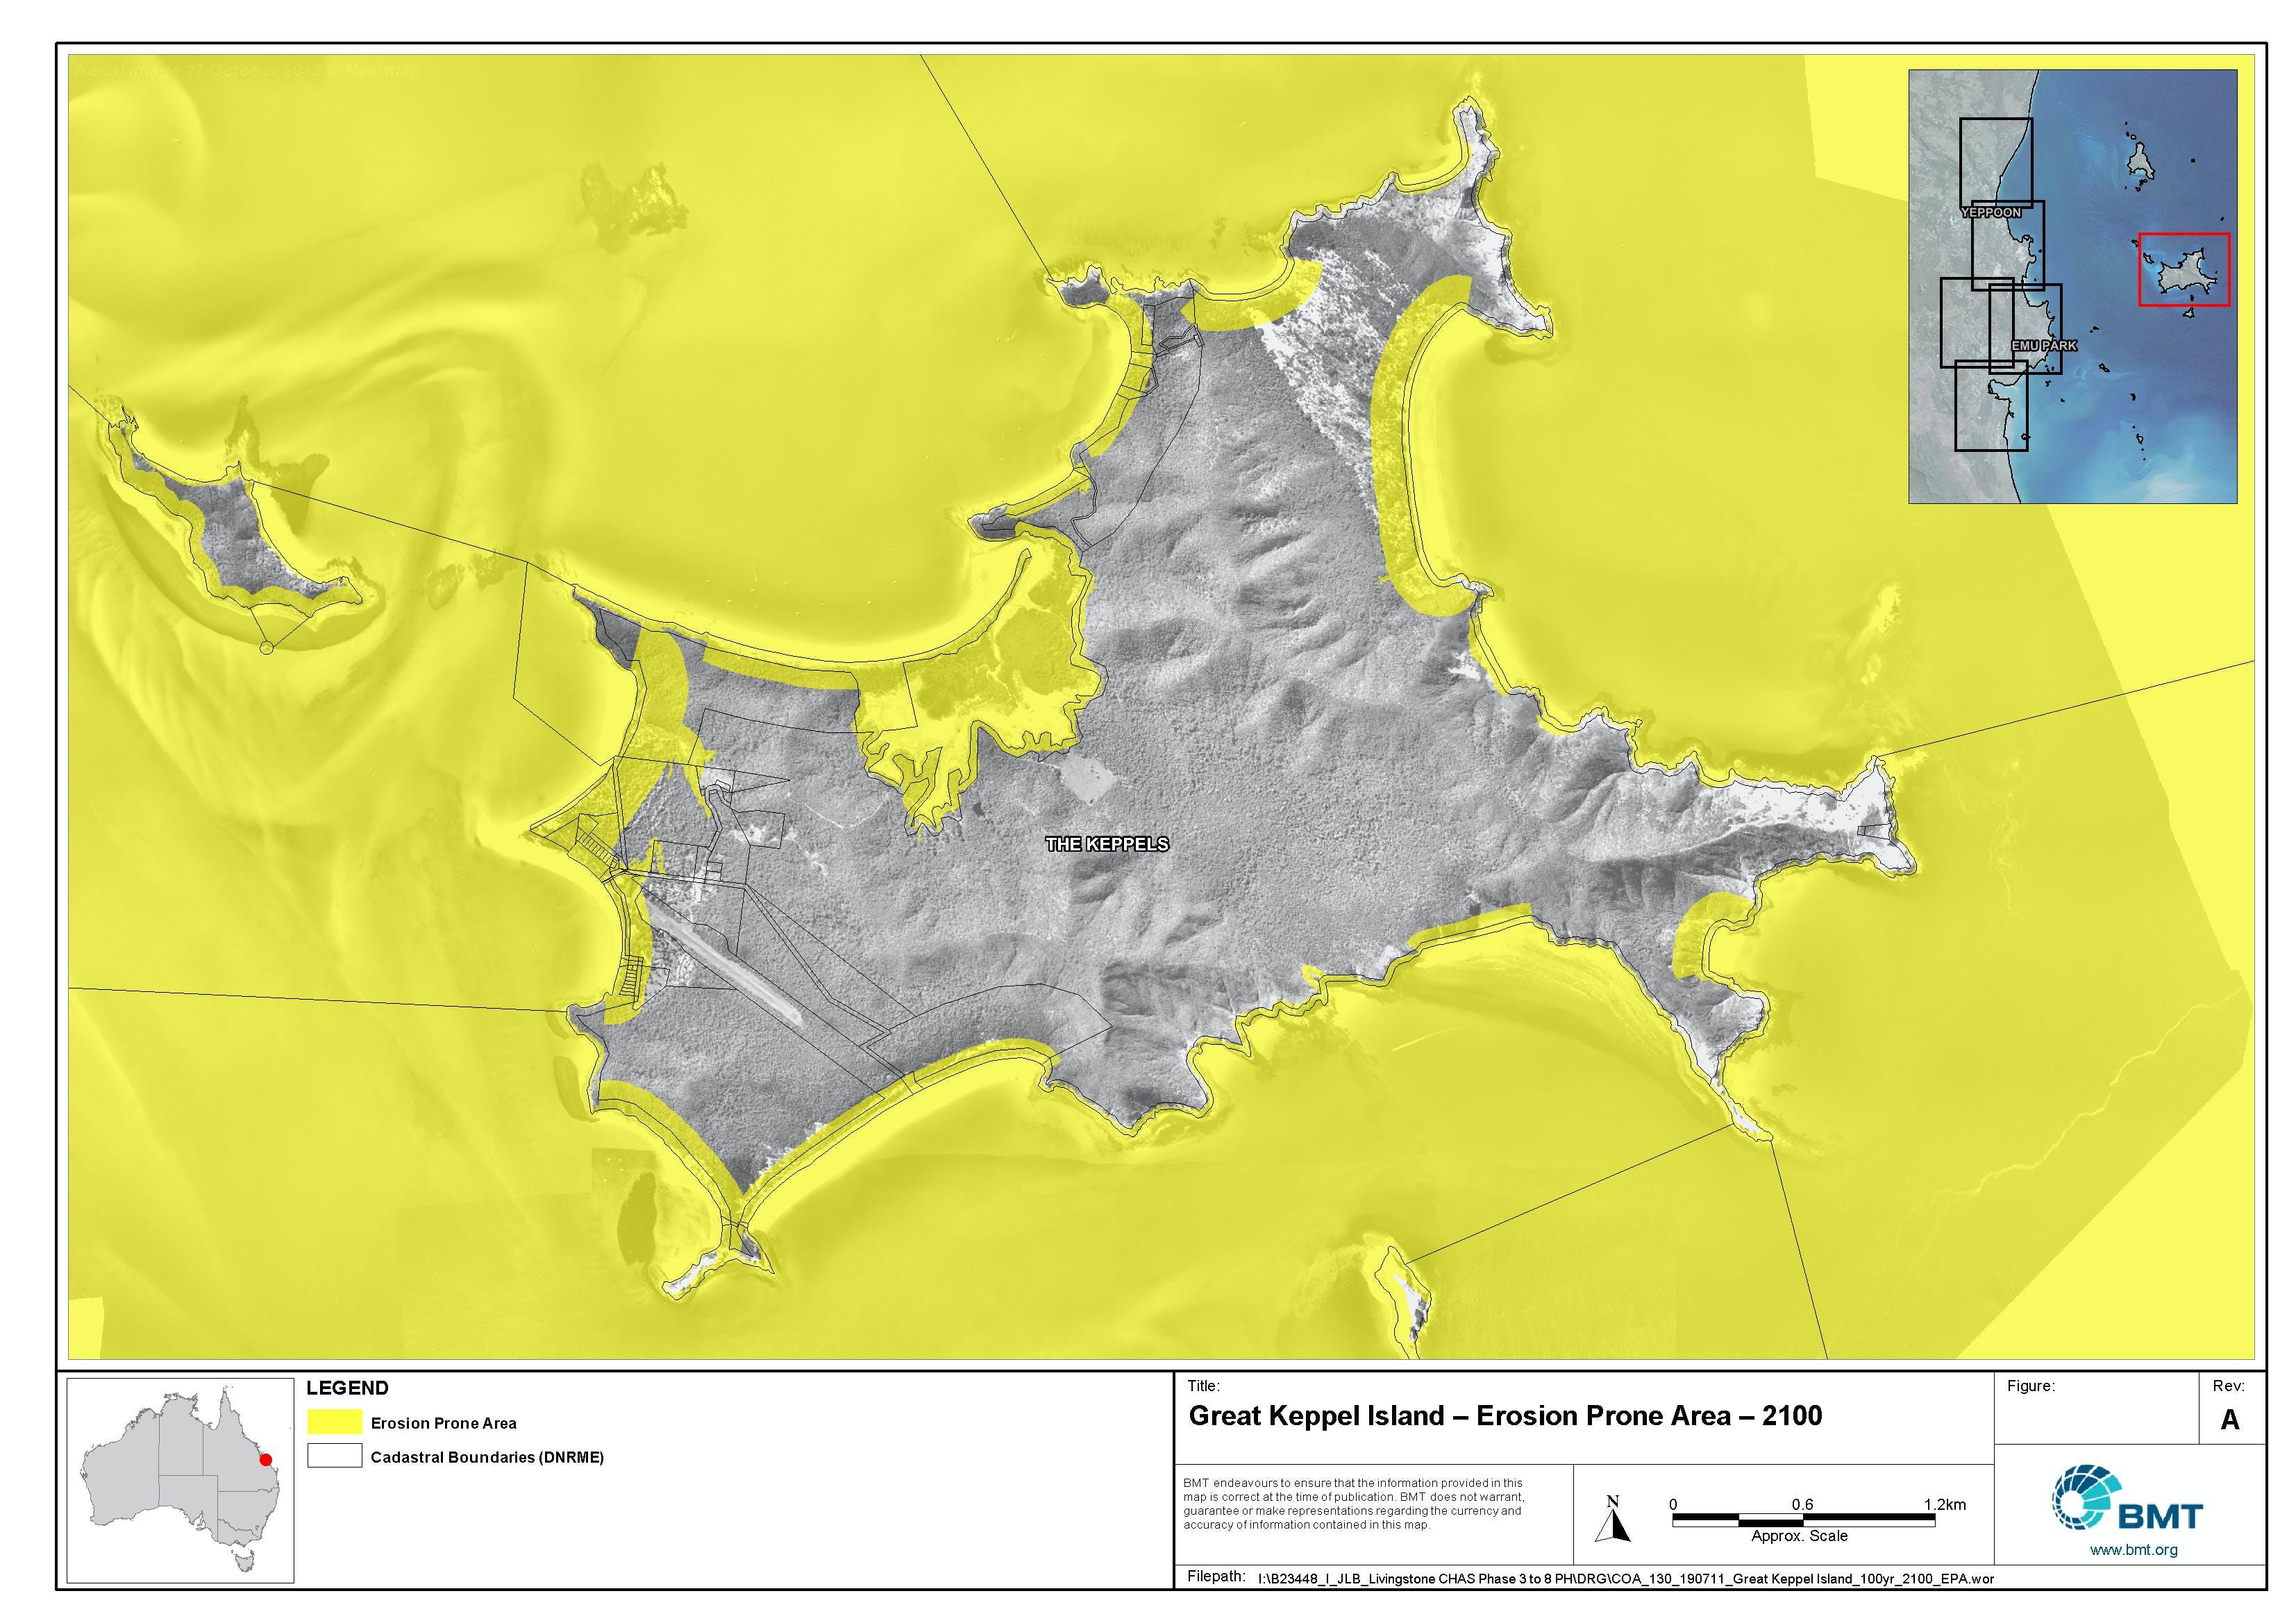 COA_130_190711_Great Keppel Island_100yr_2100_EPA.jpg